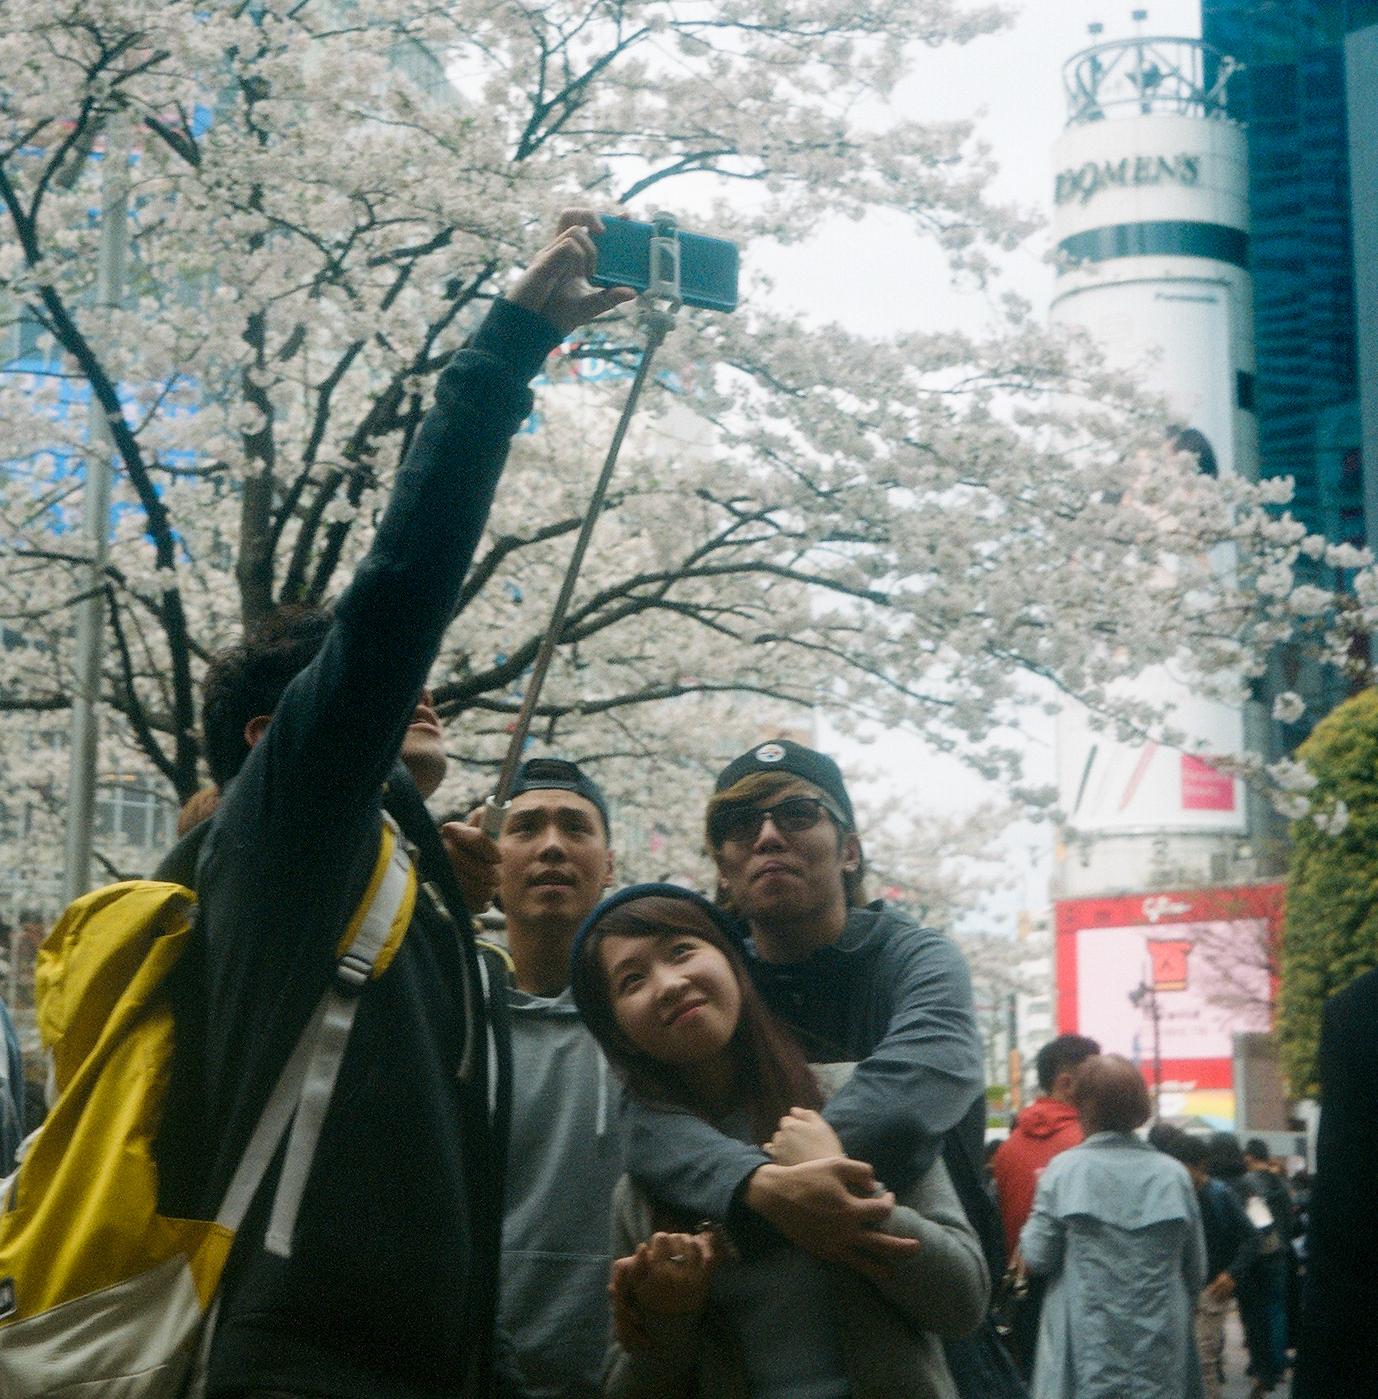 2017_04_06 Japan Tokyo Autocord Kodak 400-3.jpg